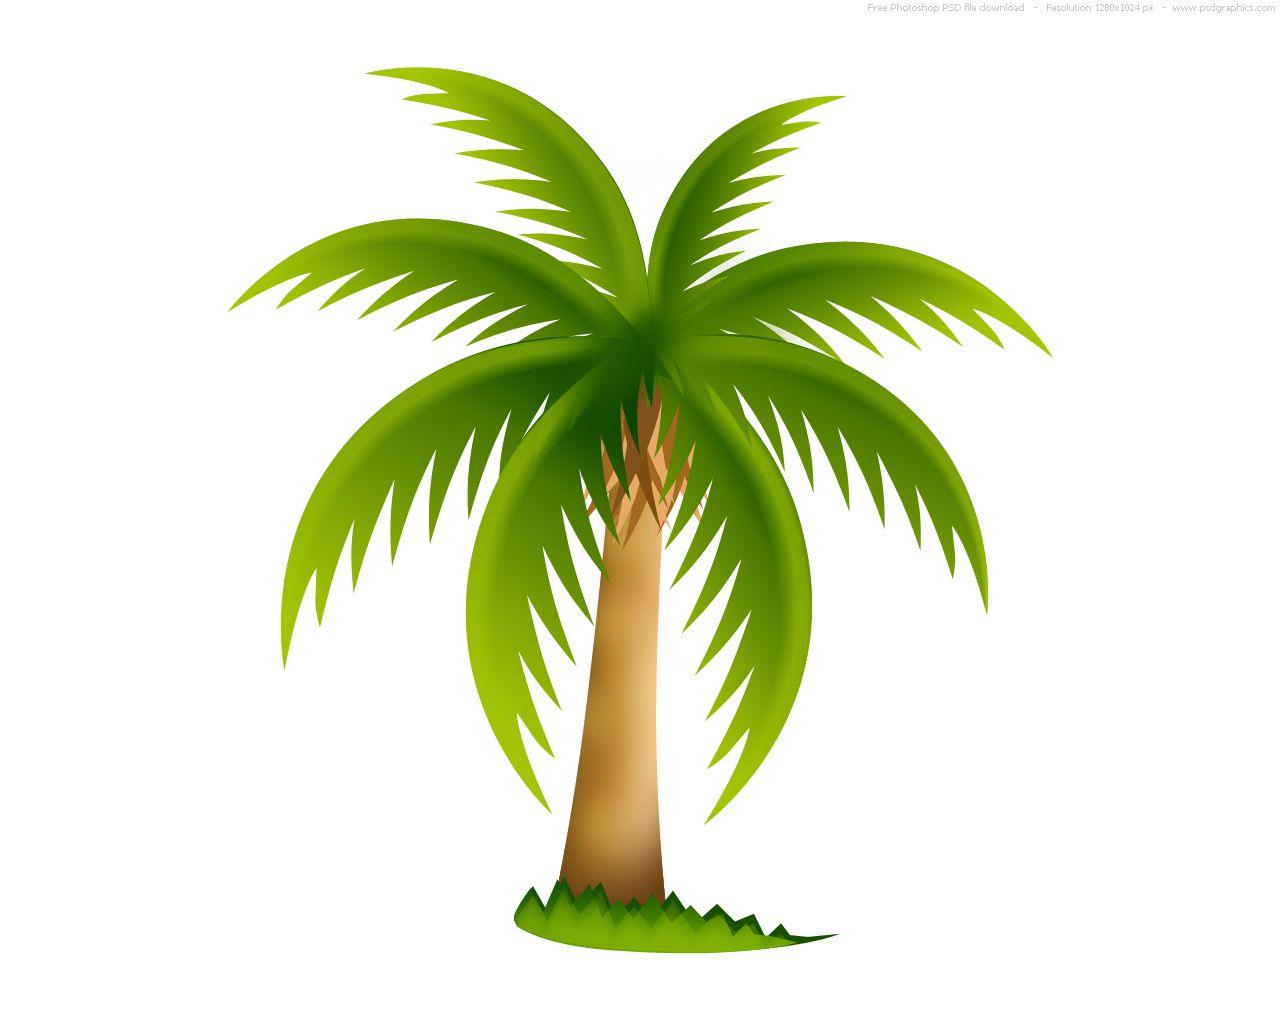 tree clipart palm tree image vector clip art online royalty free public domain [ 1280 x 1024 Pixel ]